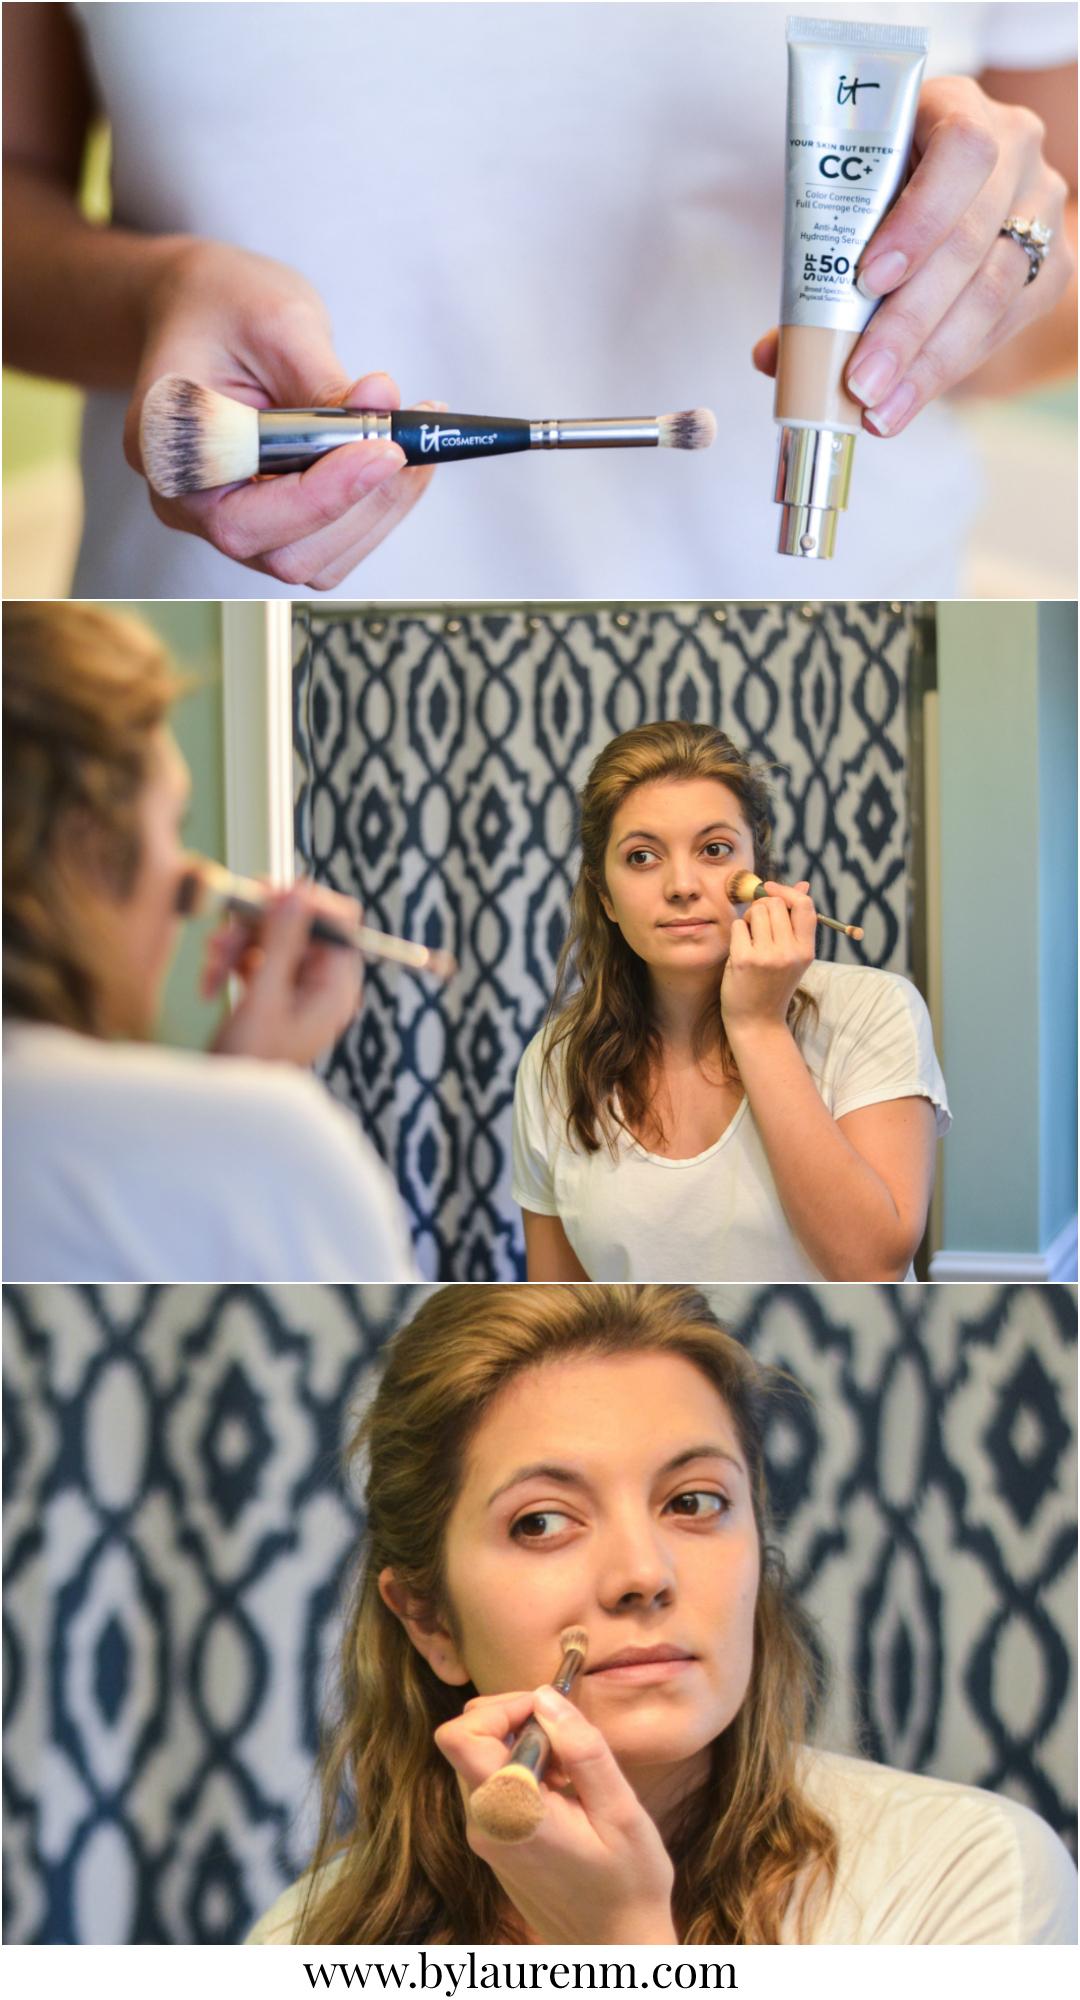 IT Cosmetics makeup tutorial | www.bylaurenm.com